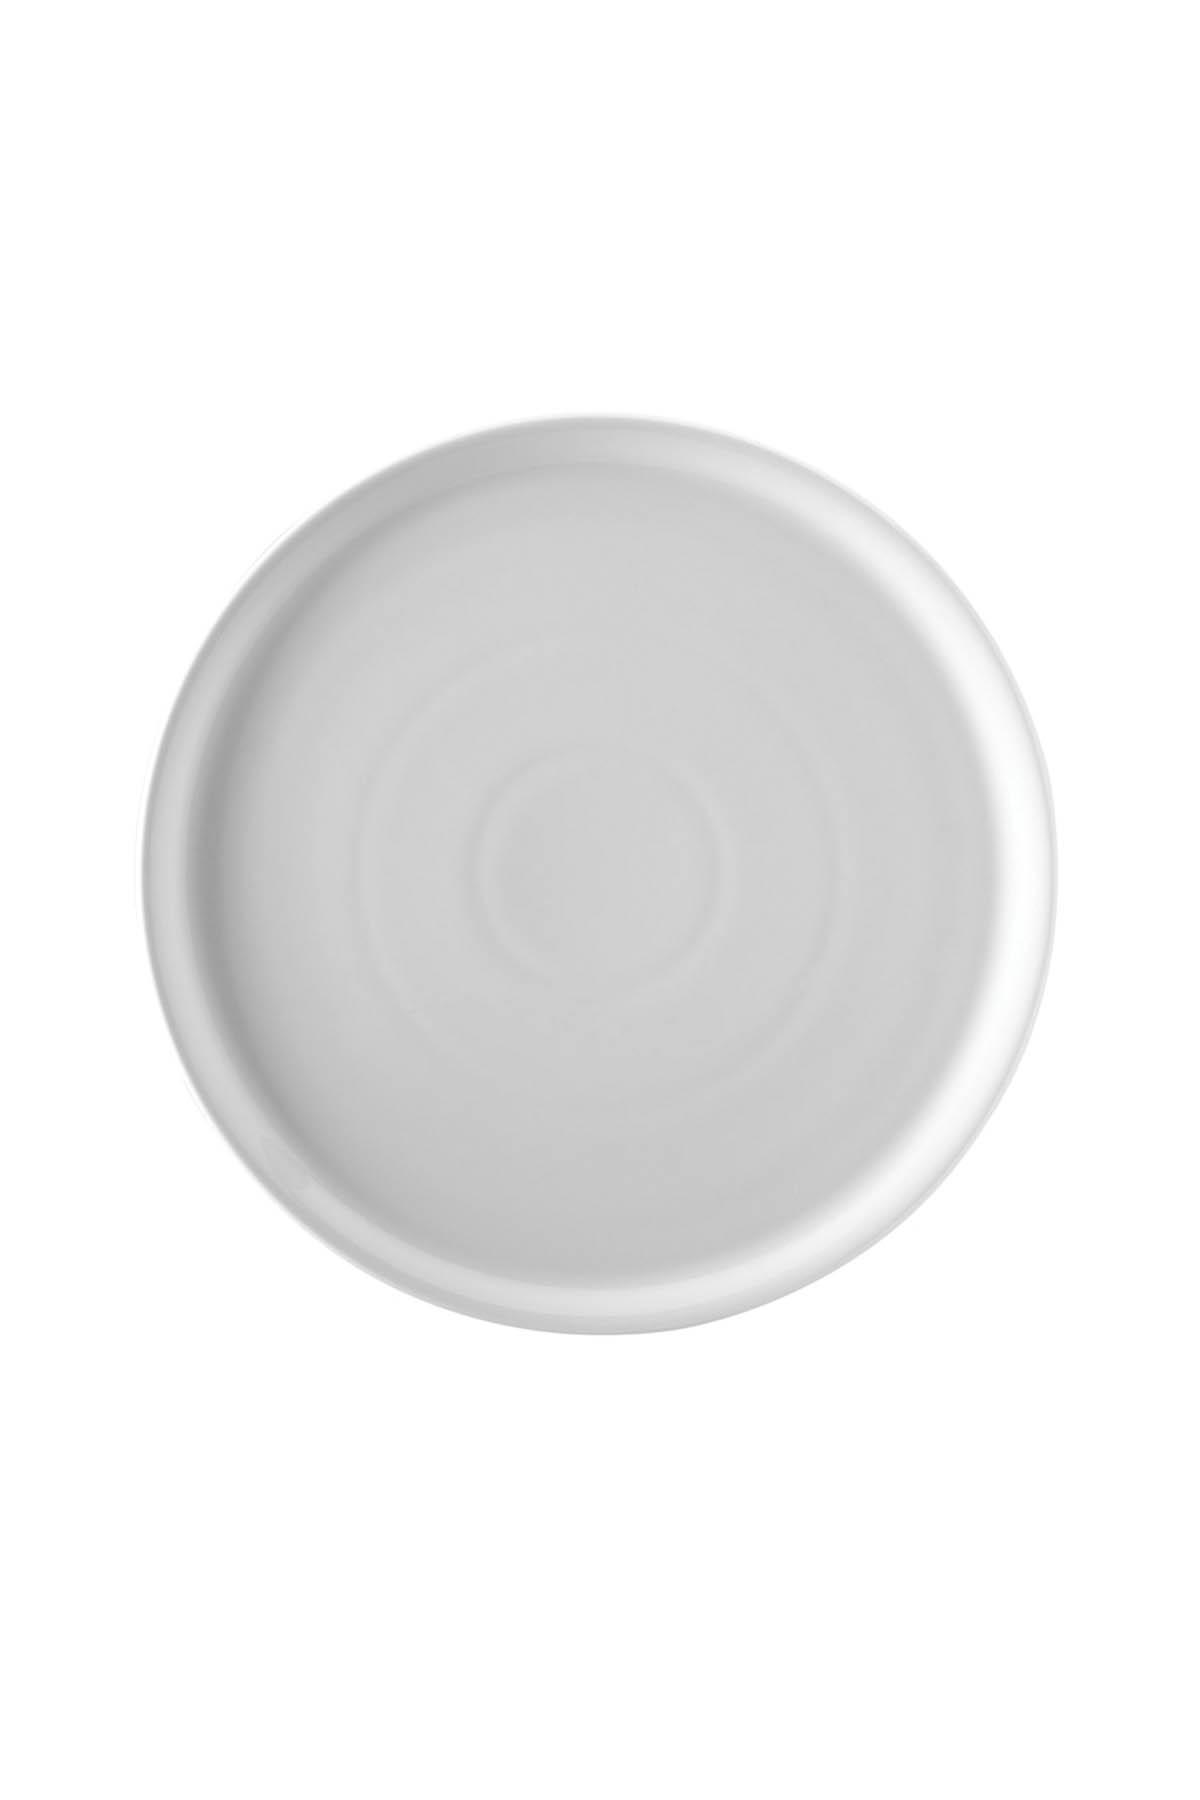 Kütahya Porselen Harlek 31.3 cm Pizza Tabak